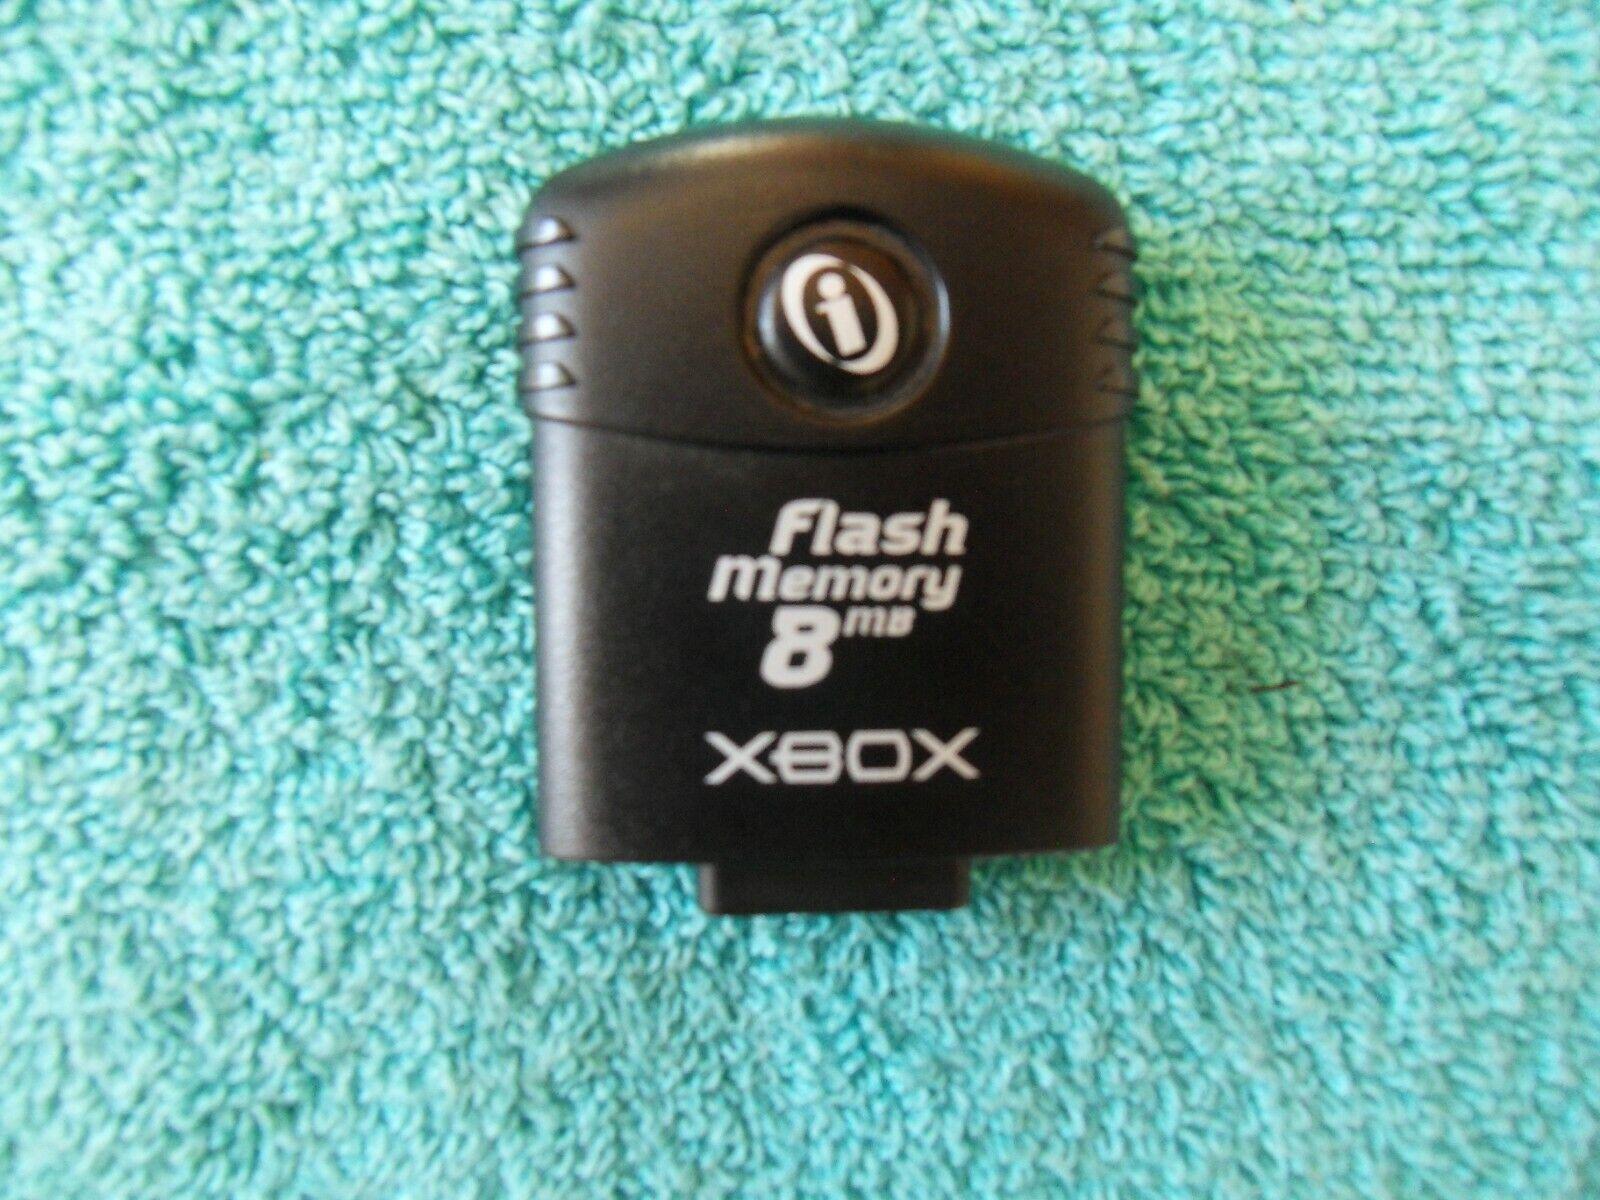 8mb FLASH MEMORY CARD - microsoft xbox